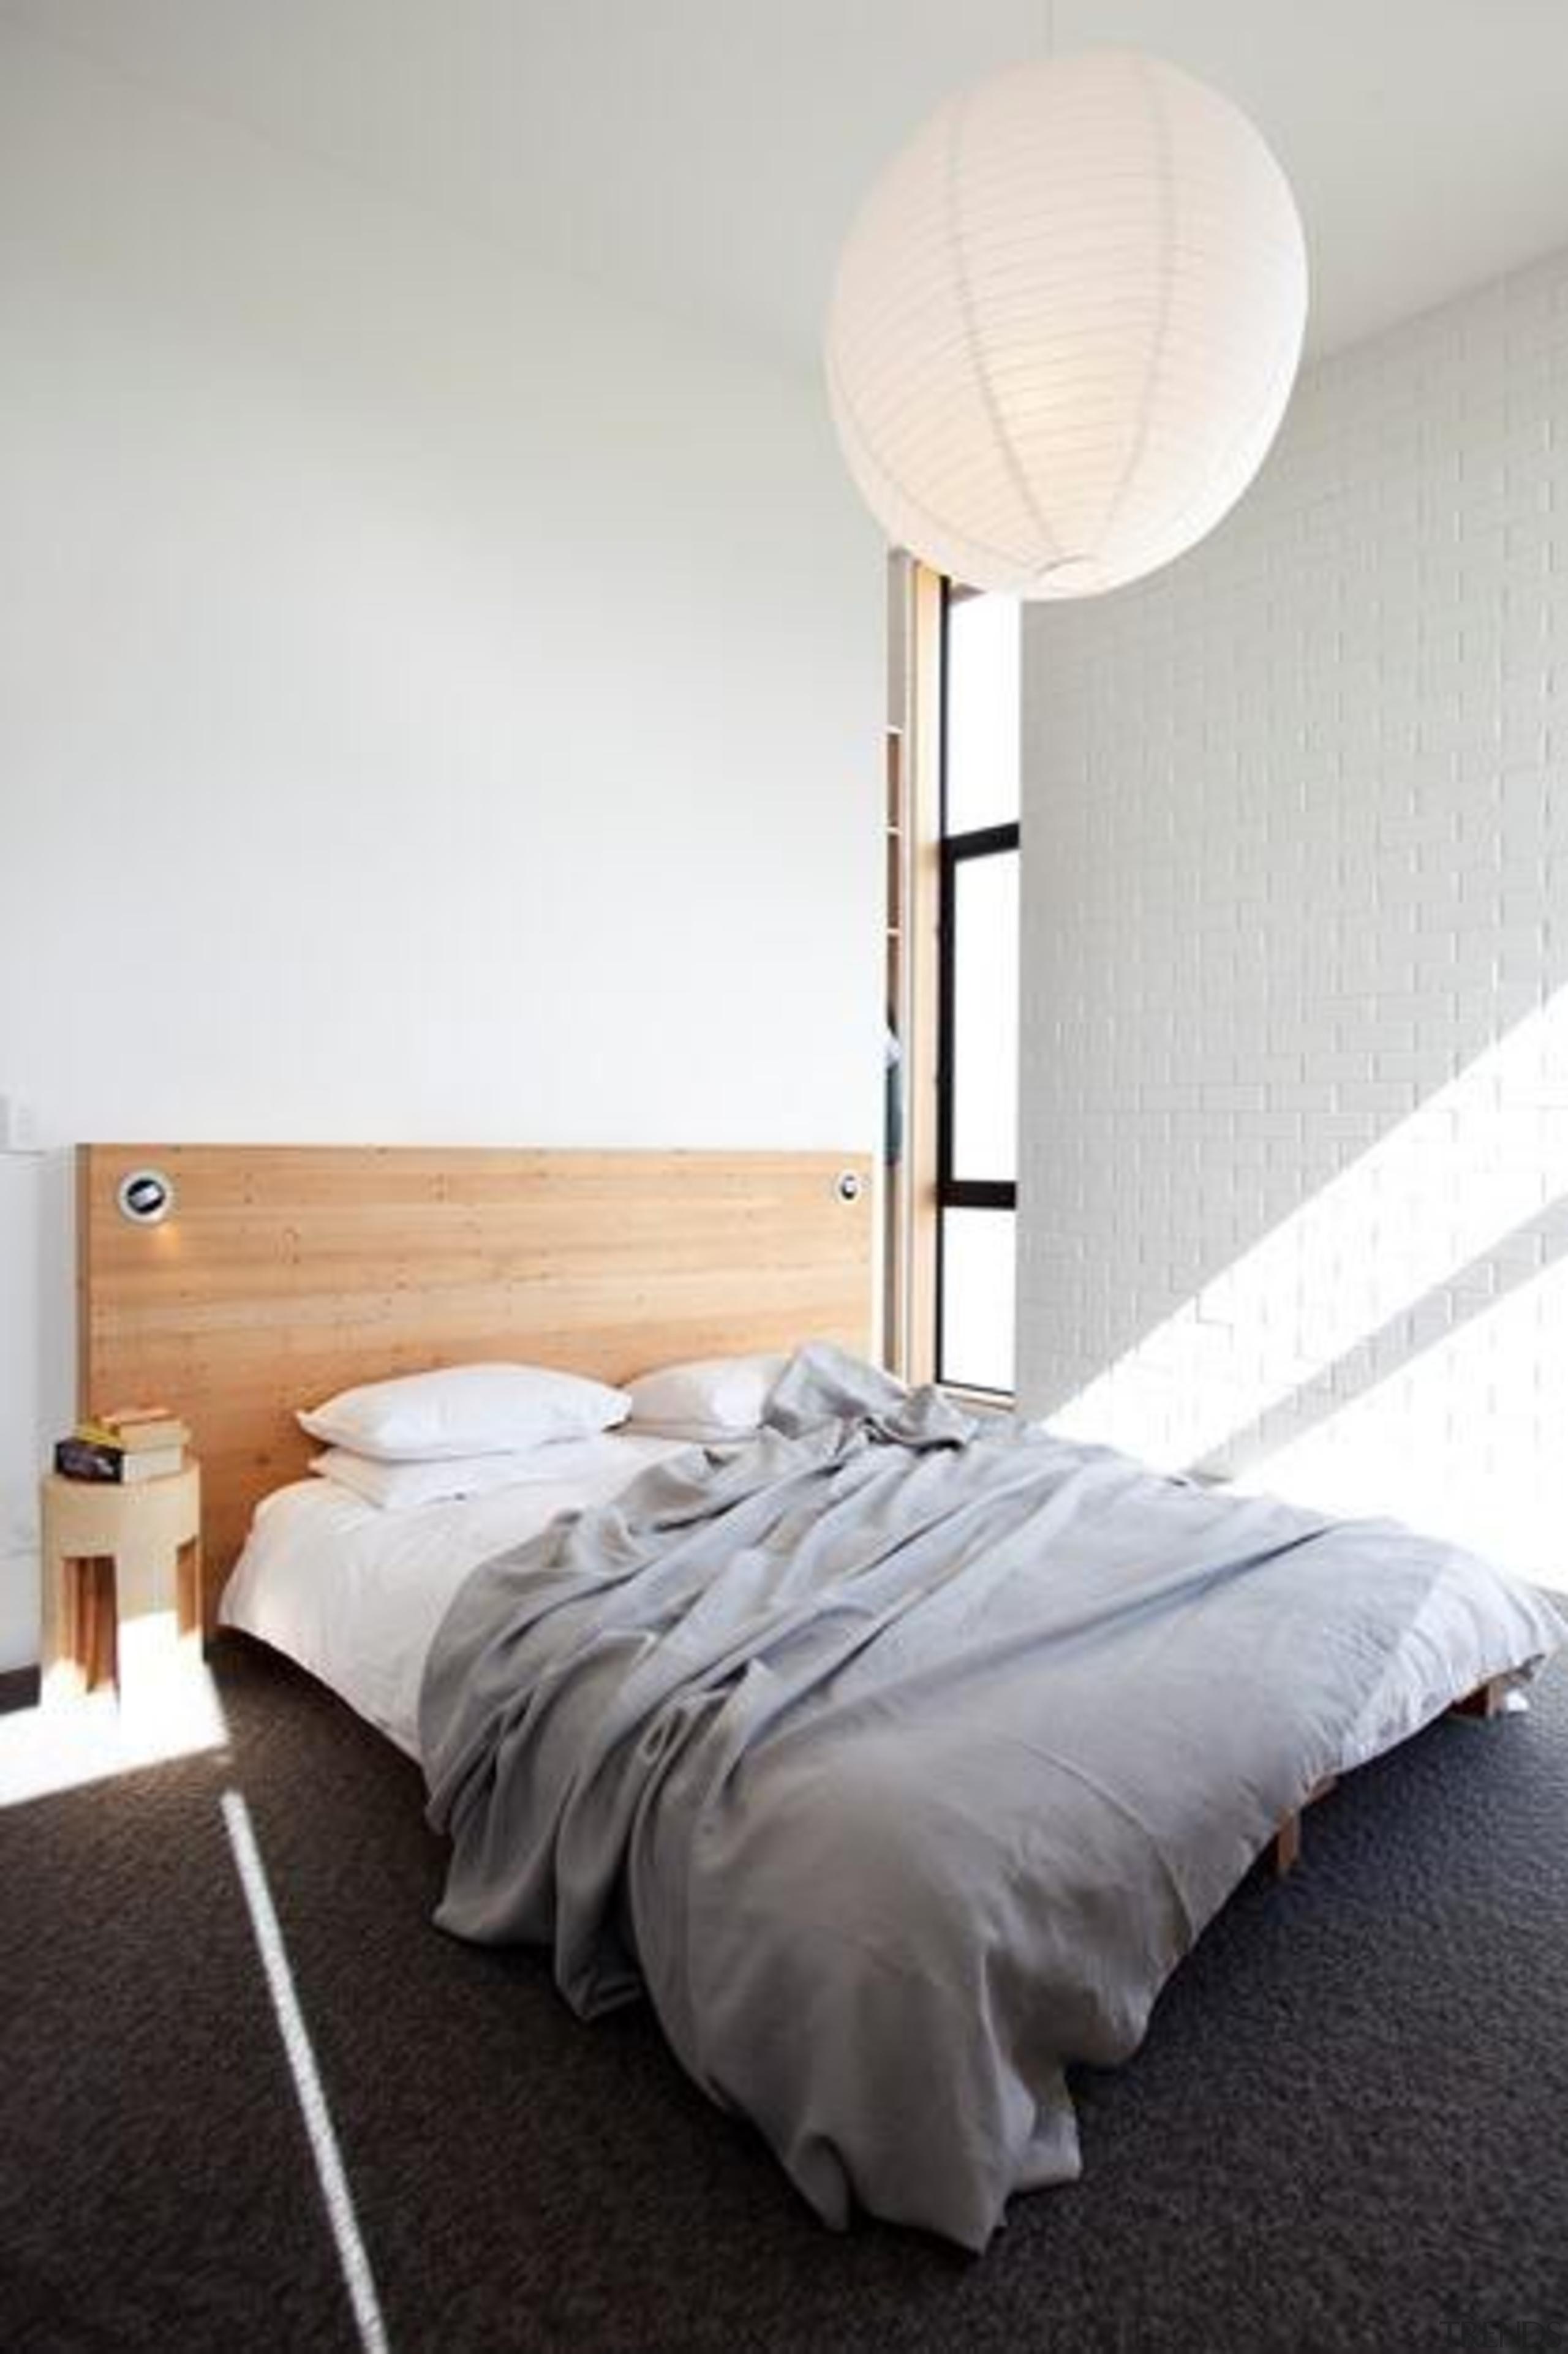 master bedroom - master bedroom - bed   bed, bed frame, bedroom, ceiling, floor, flooring, furniture, interior design, light fixture, lighting, mattress, product design, room, wall, wood, white, gray